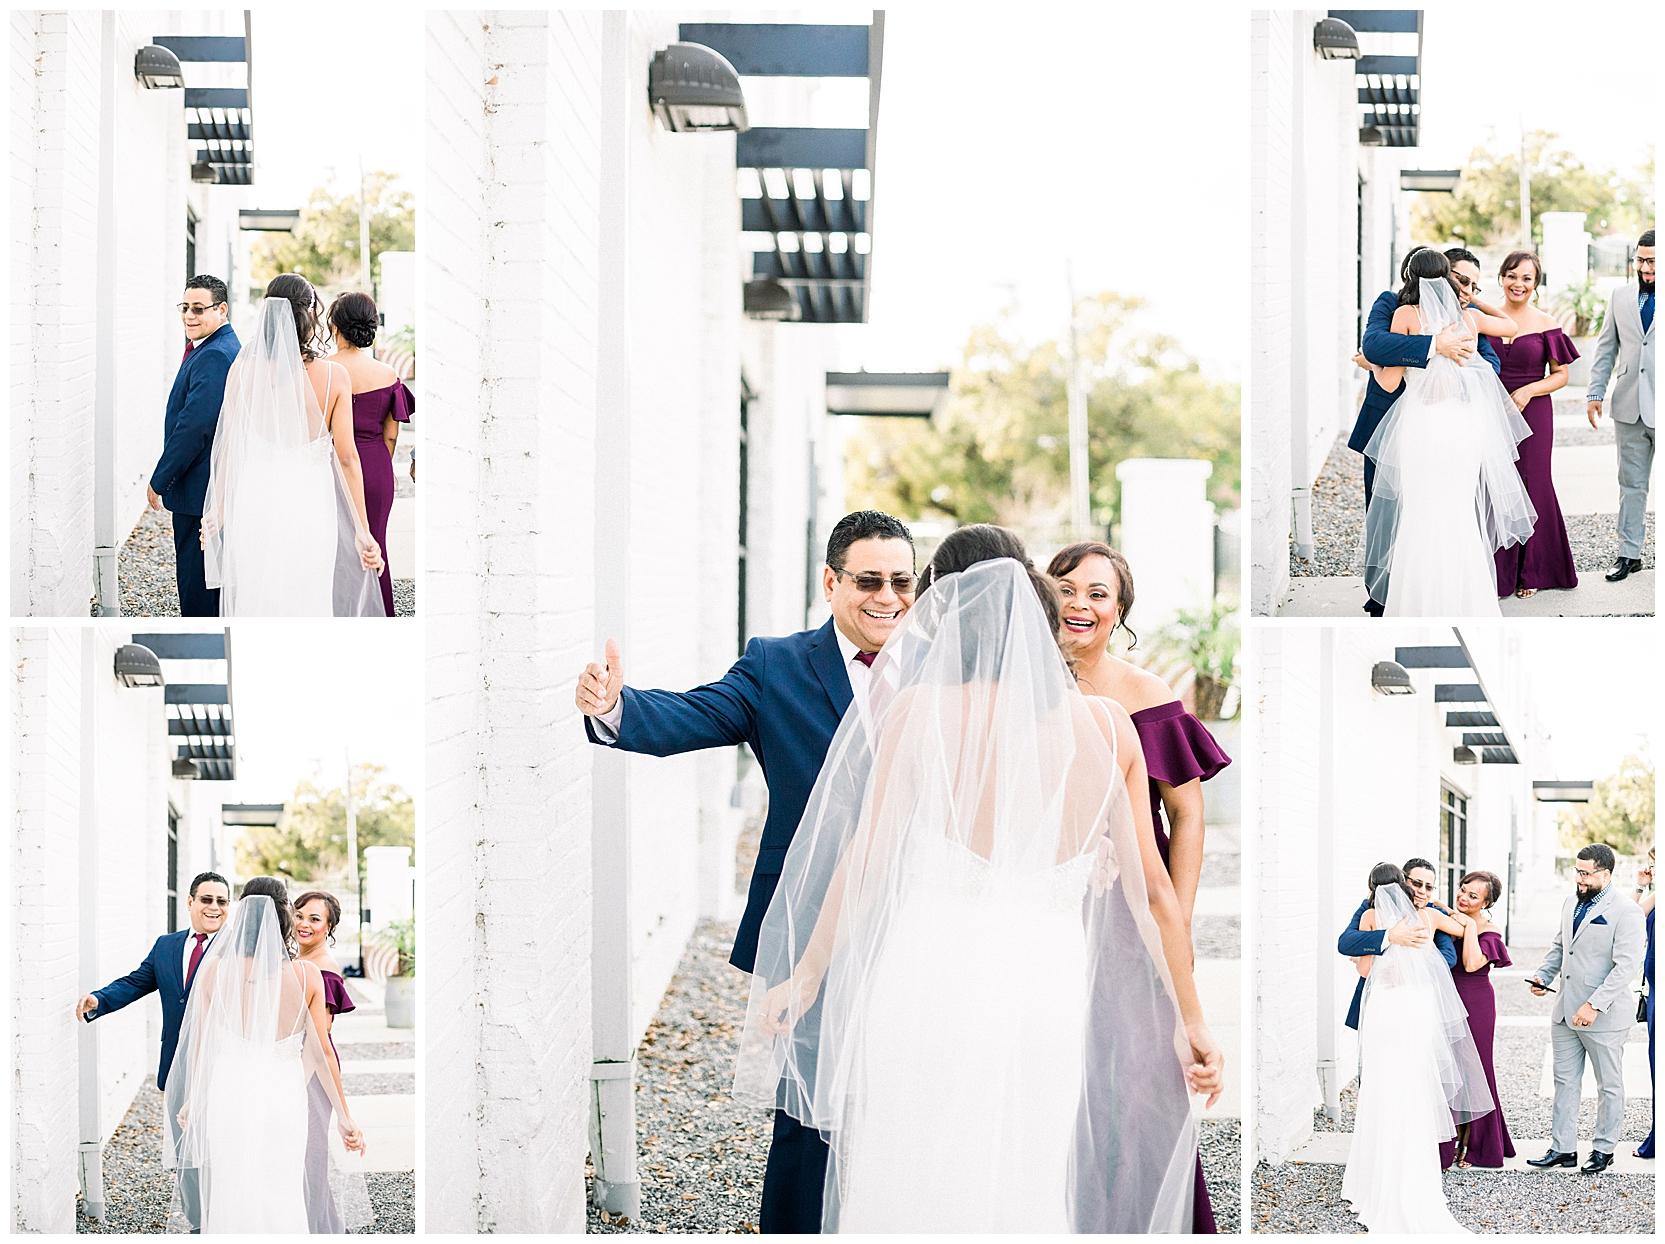 jessicafredericks_lakeland_tampa_wedding_purple_crazy hour_0037.jpg